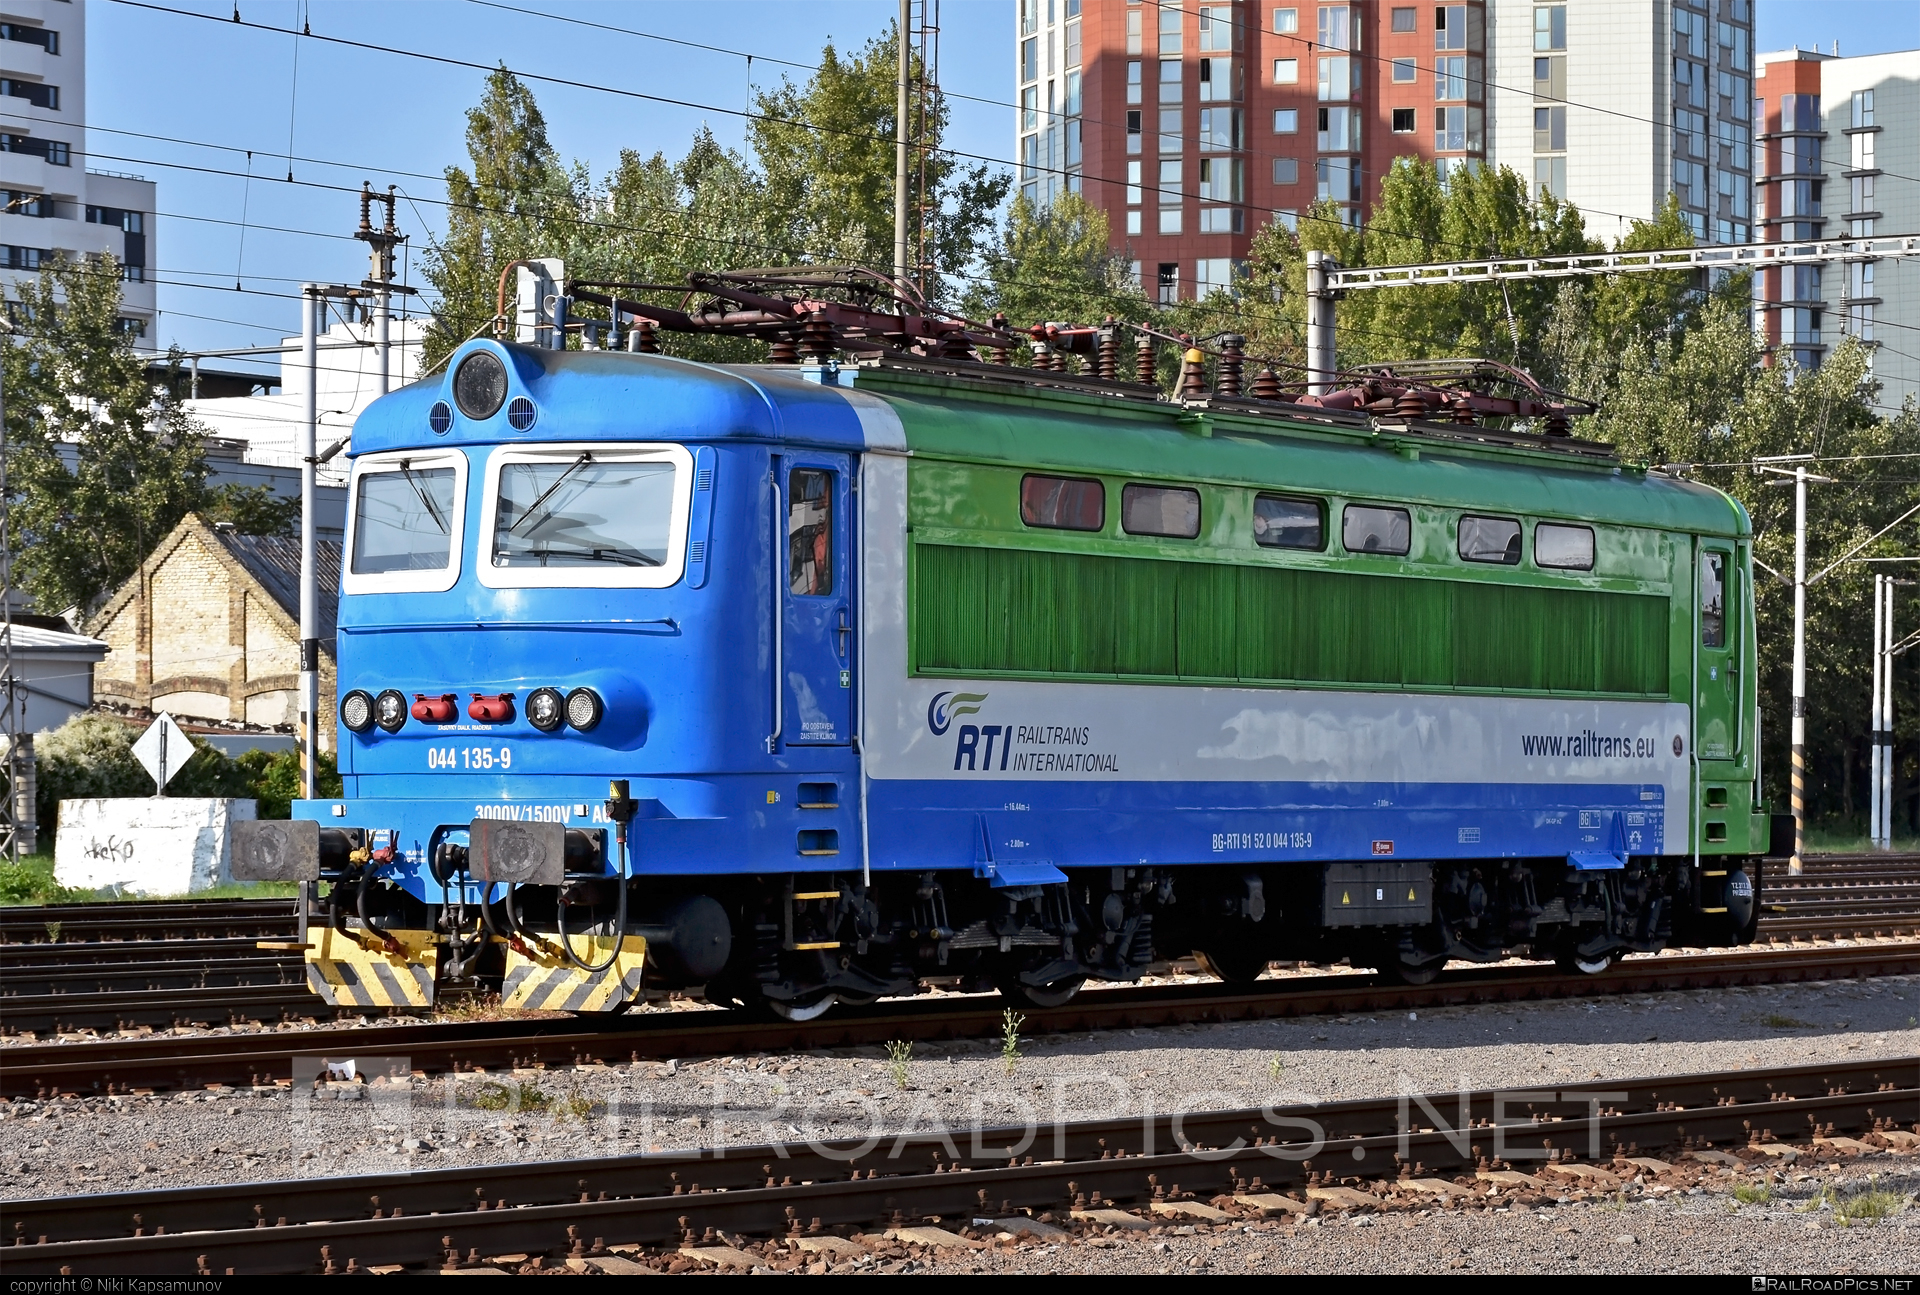 Škoda 73E - 044 135-9 operated by Railtrans International, s.r.o #locomotive242 #plechac #skoda #skoda73e